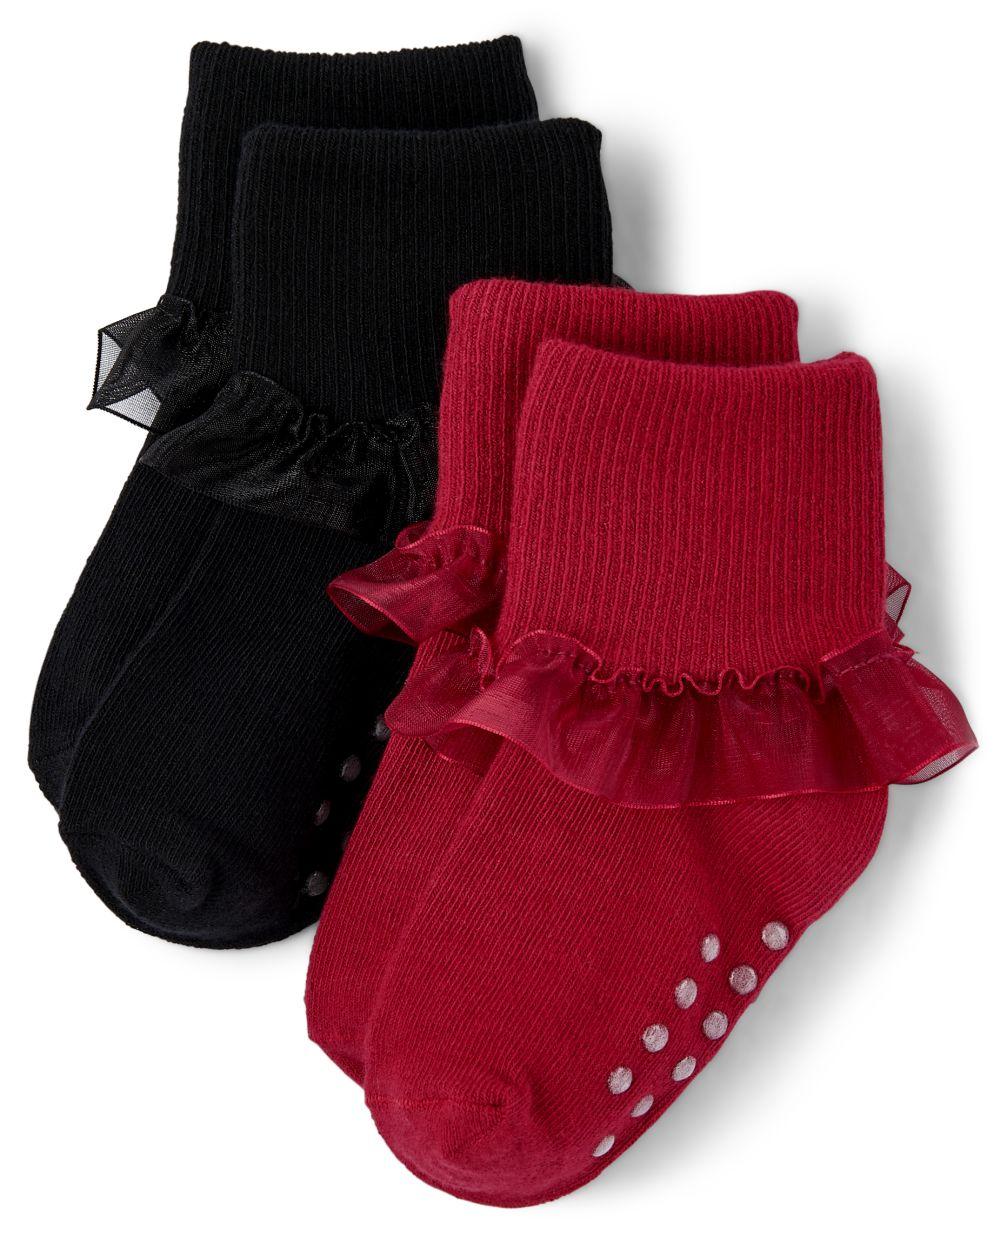 Girls Turn Cuff Socks - Picture Perfect